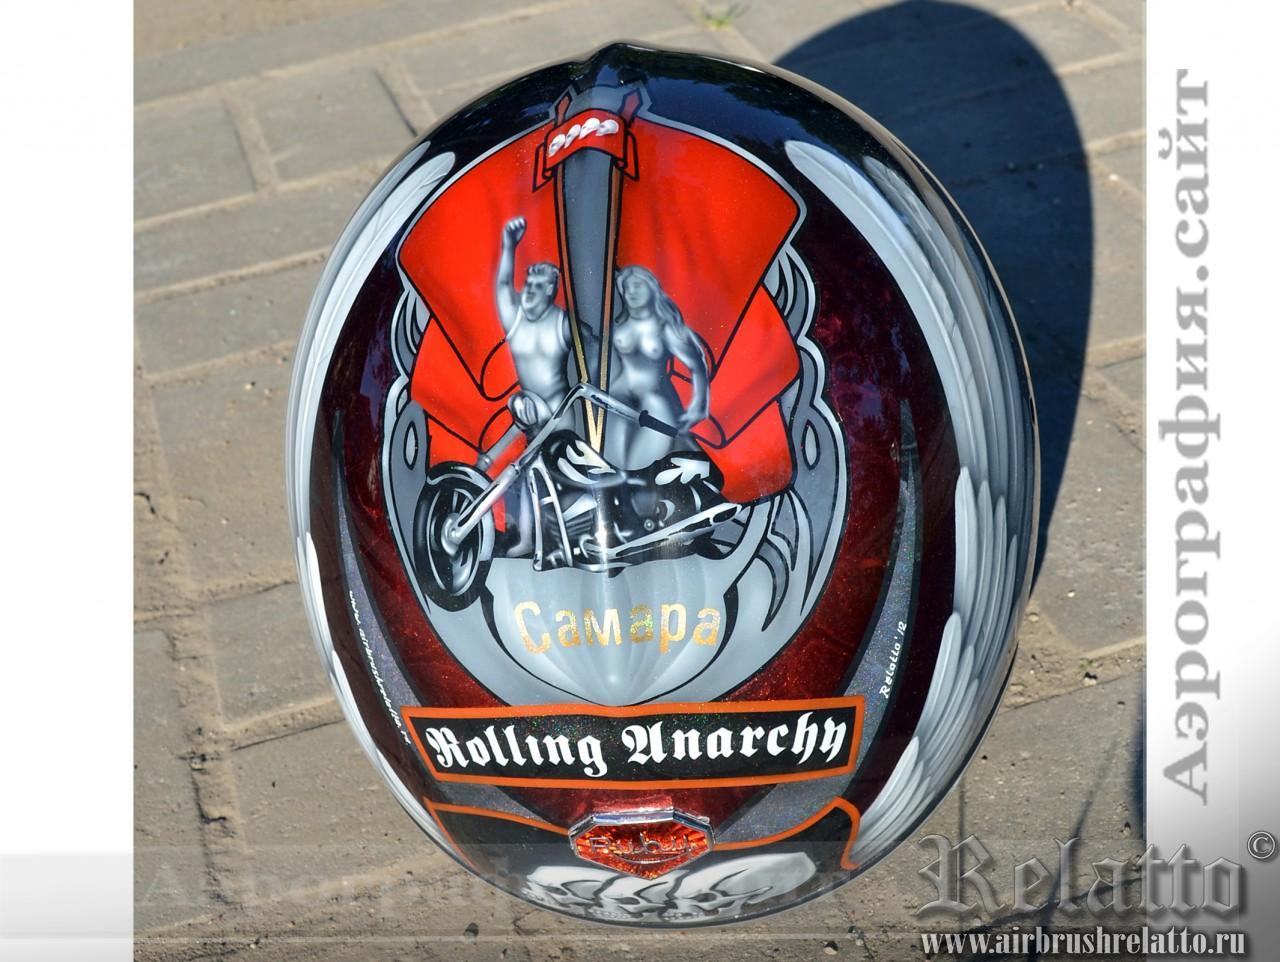 Аэрография на шлемах мотоциклистов Роллинг Анархии Самара